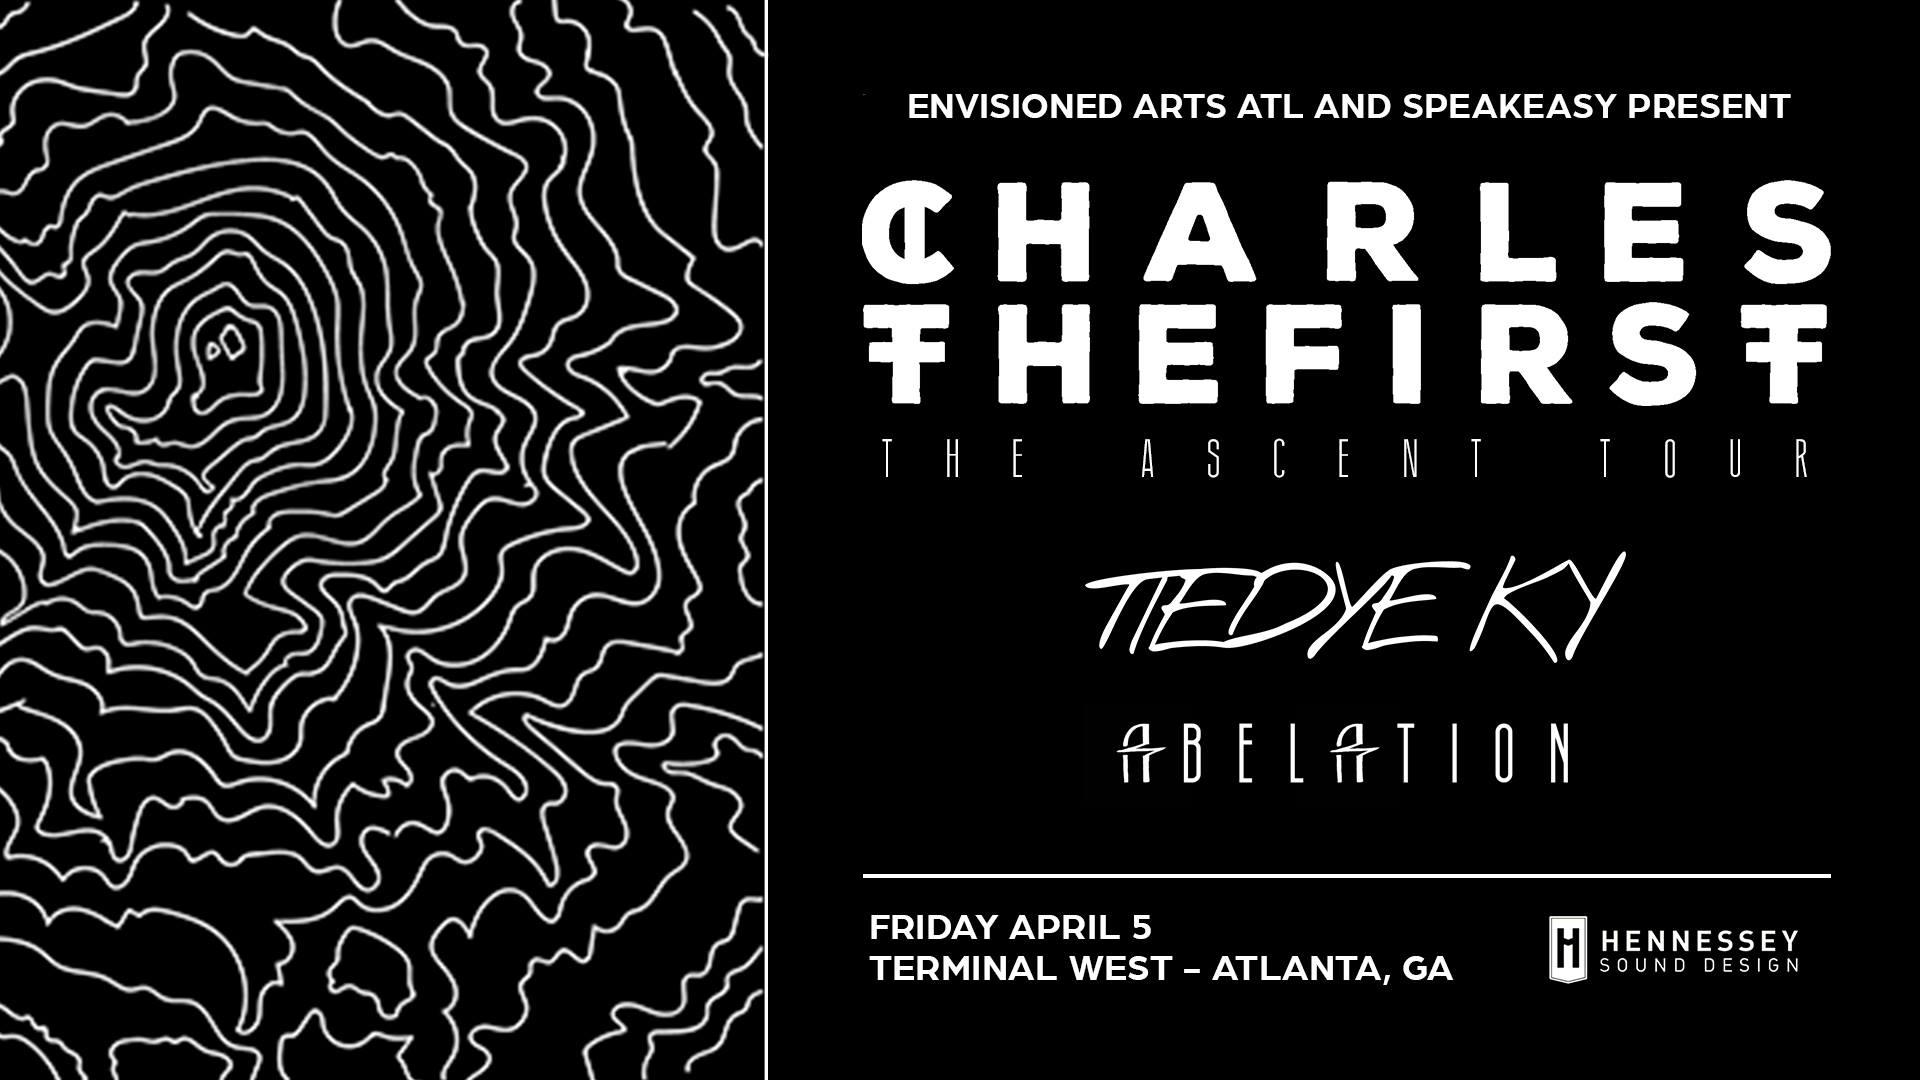 Charlesthefirst Envisioned Arts ATL Atlanta EDM Terminal West Speakeasy Promotions